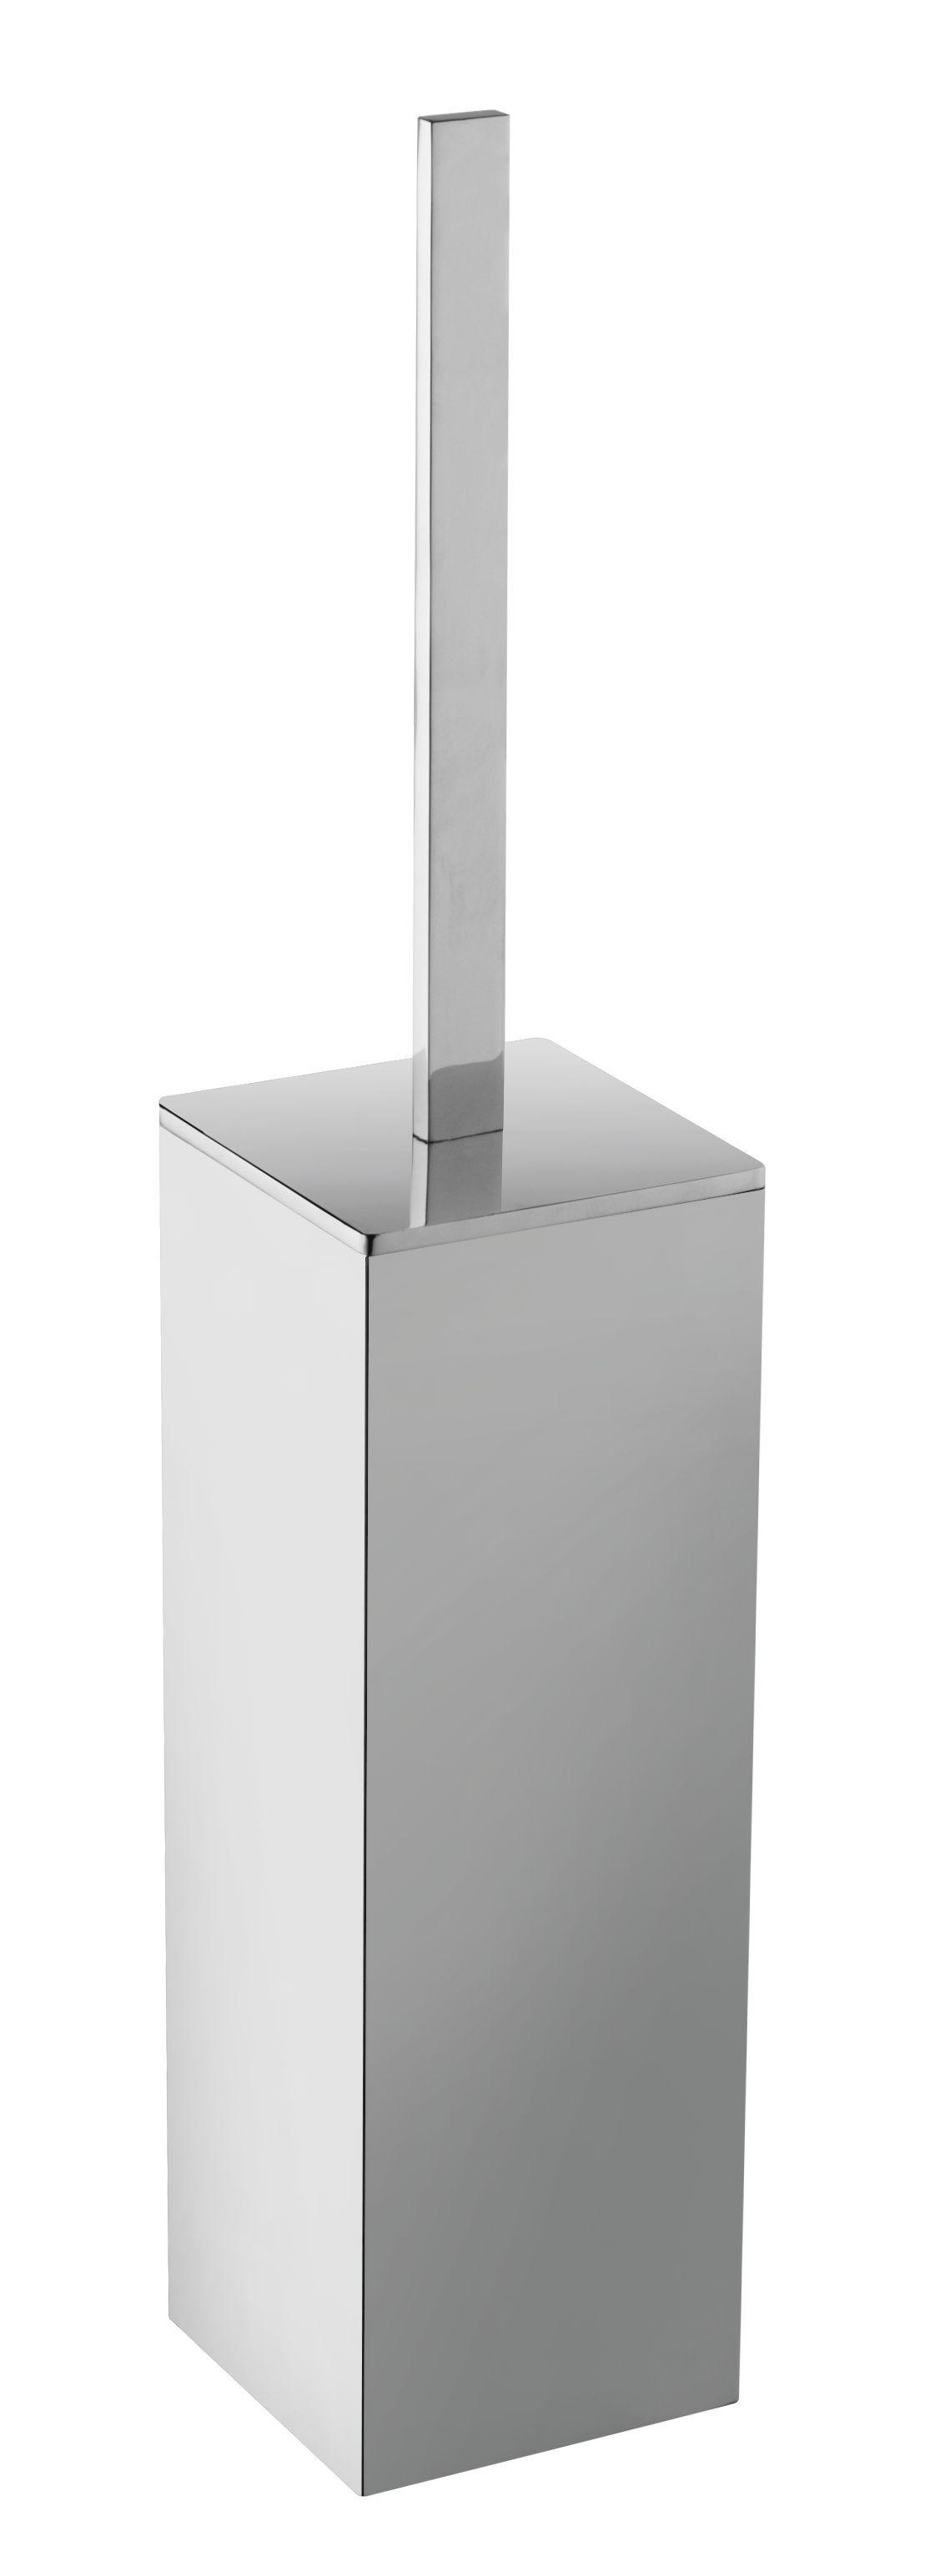 Mueller Cube vrijstaande toiletborstelhouder chroom